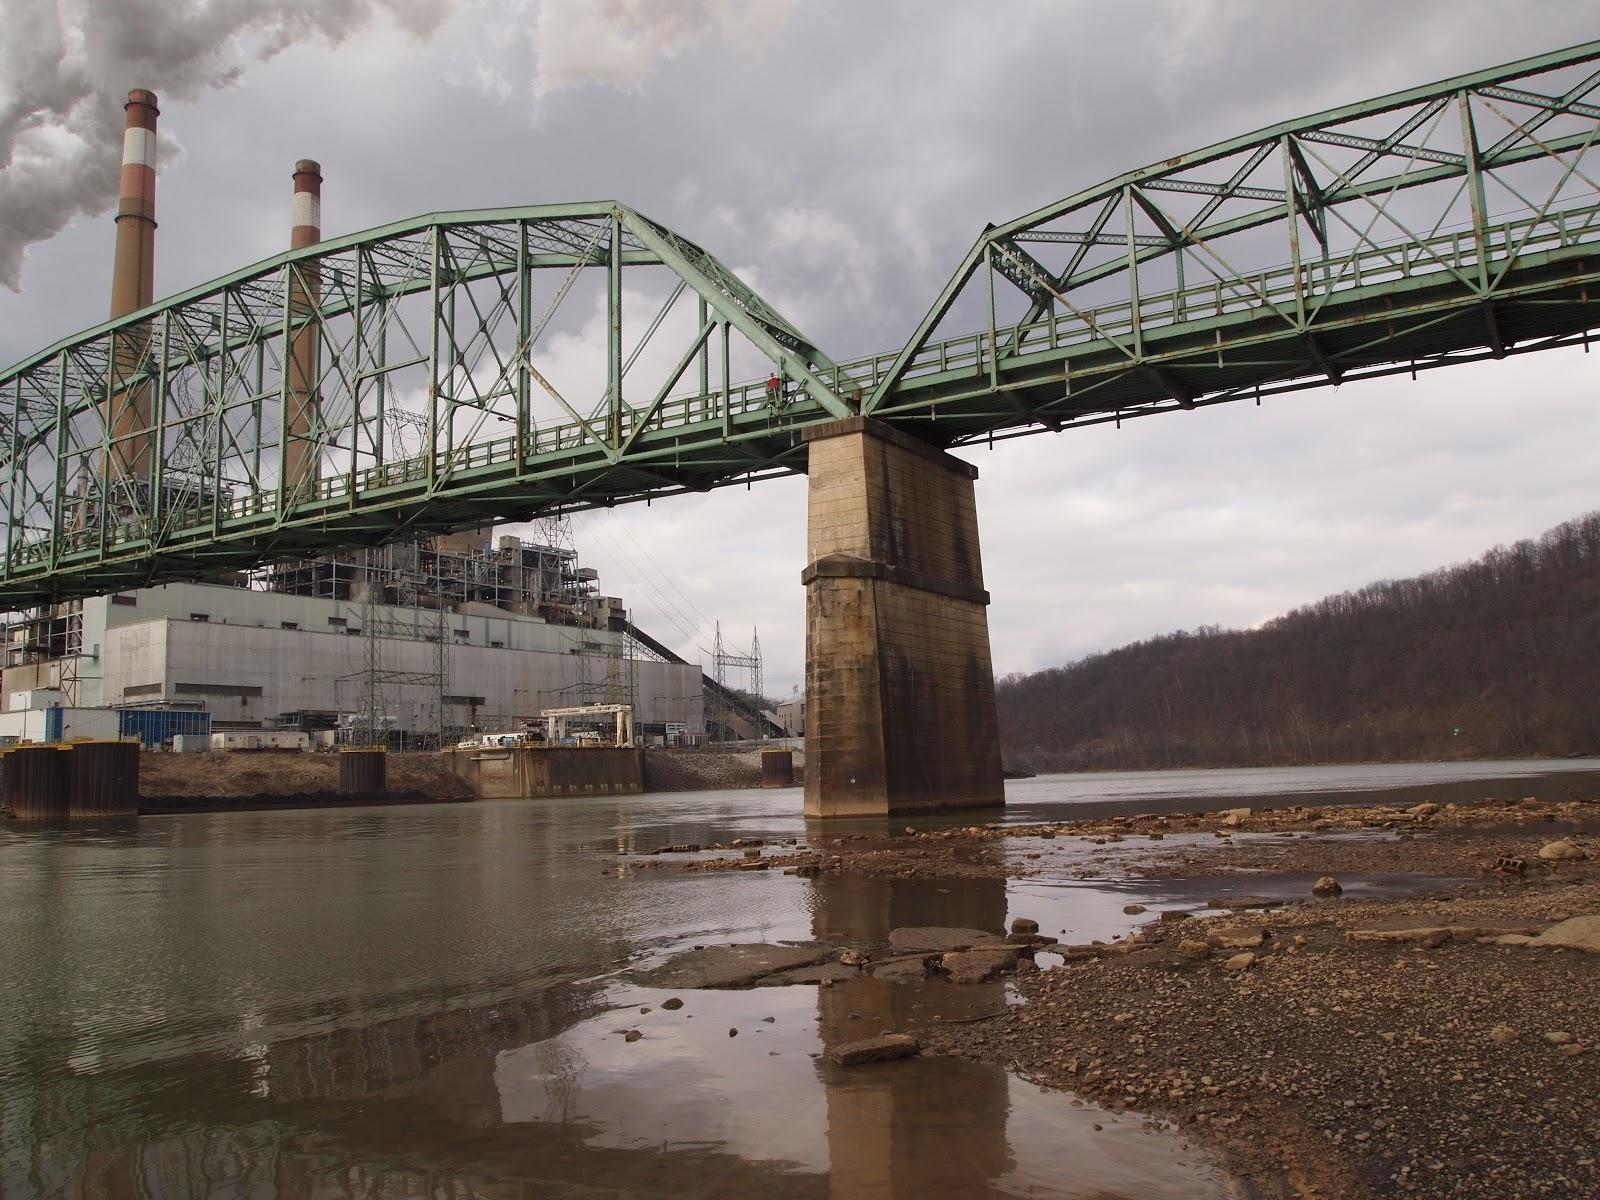 21 bridges - photo #34